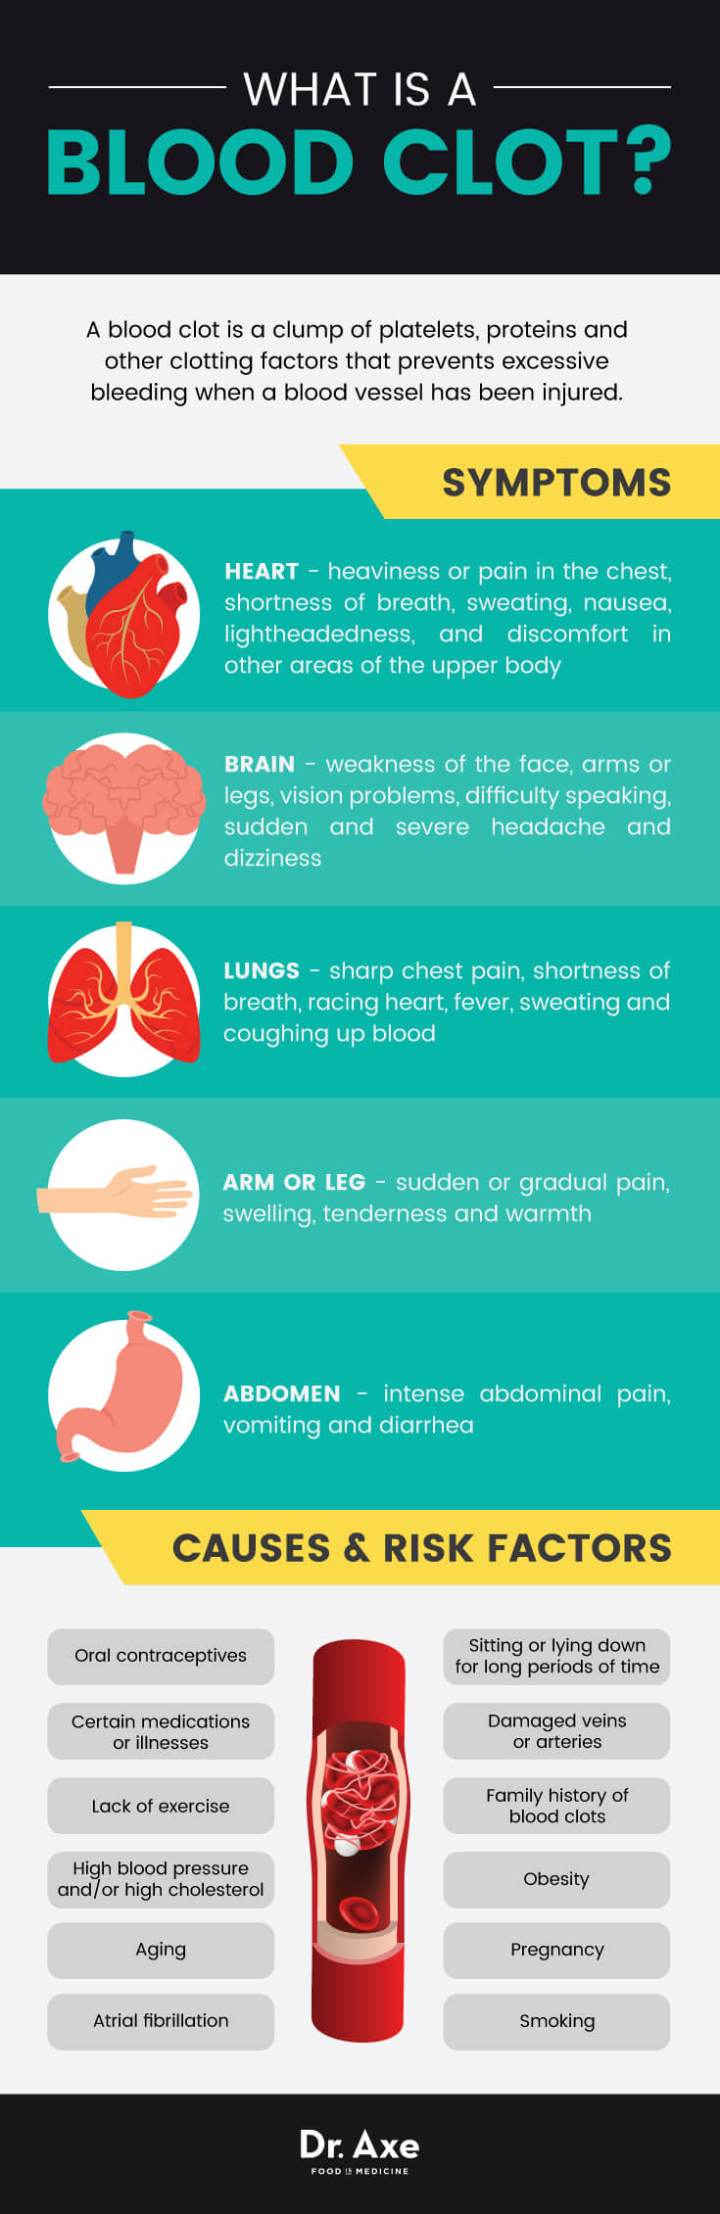 Blood clots: causes 7 symptoms